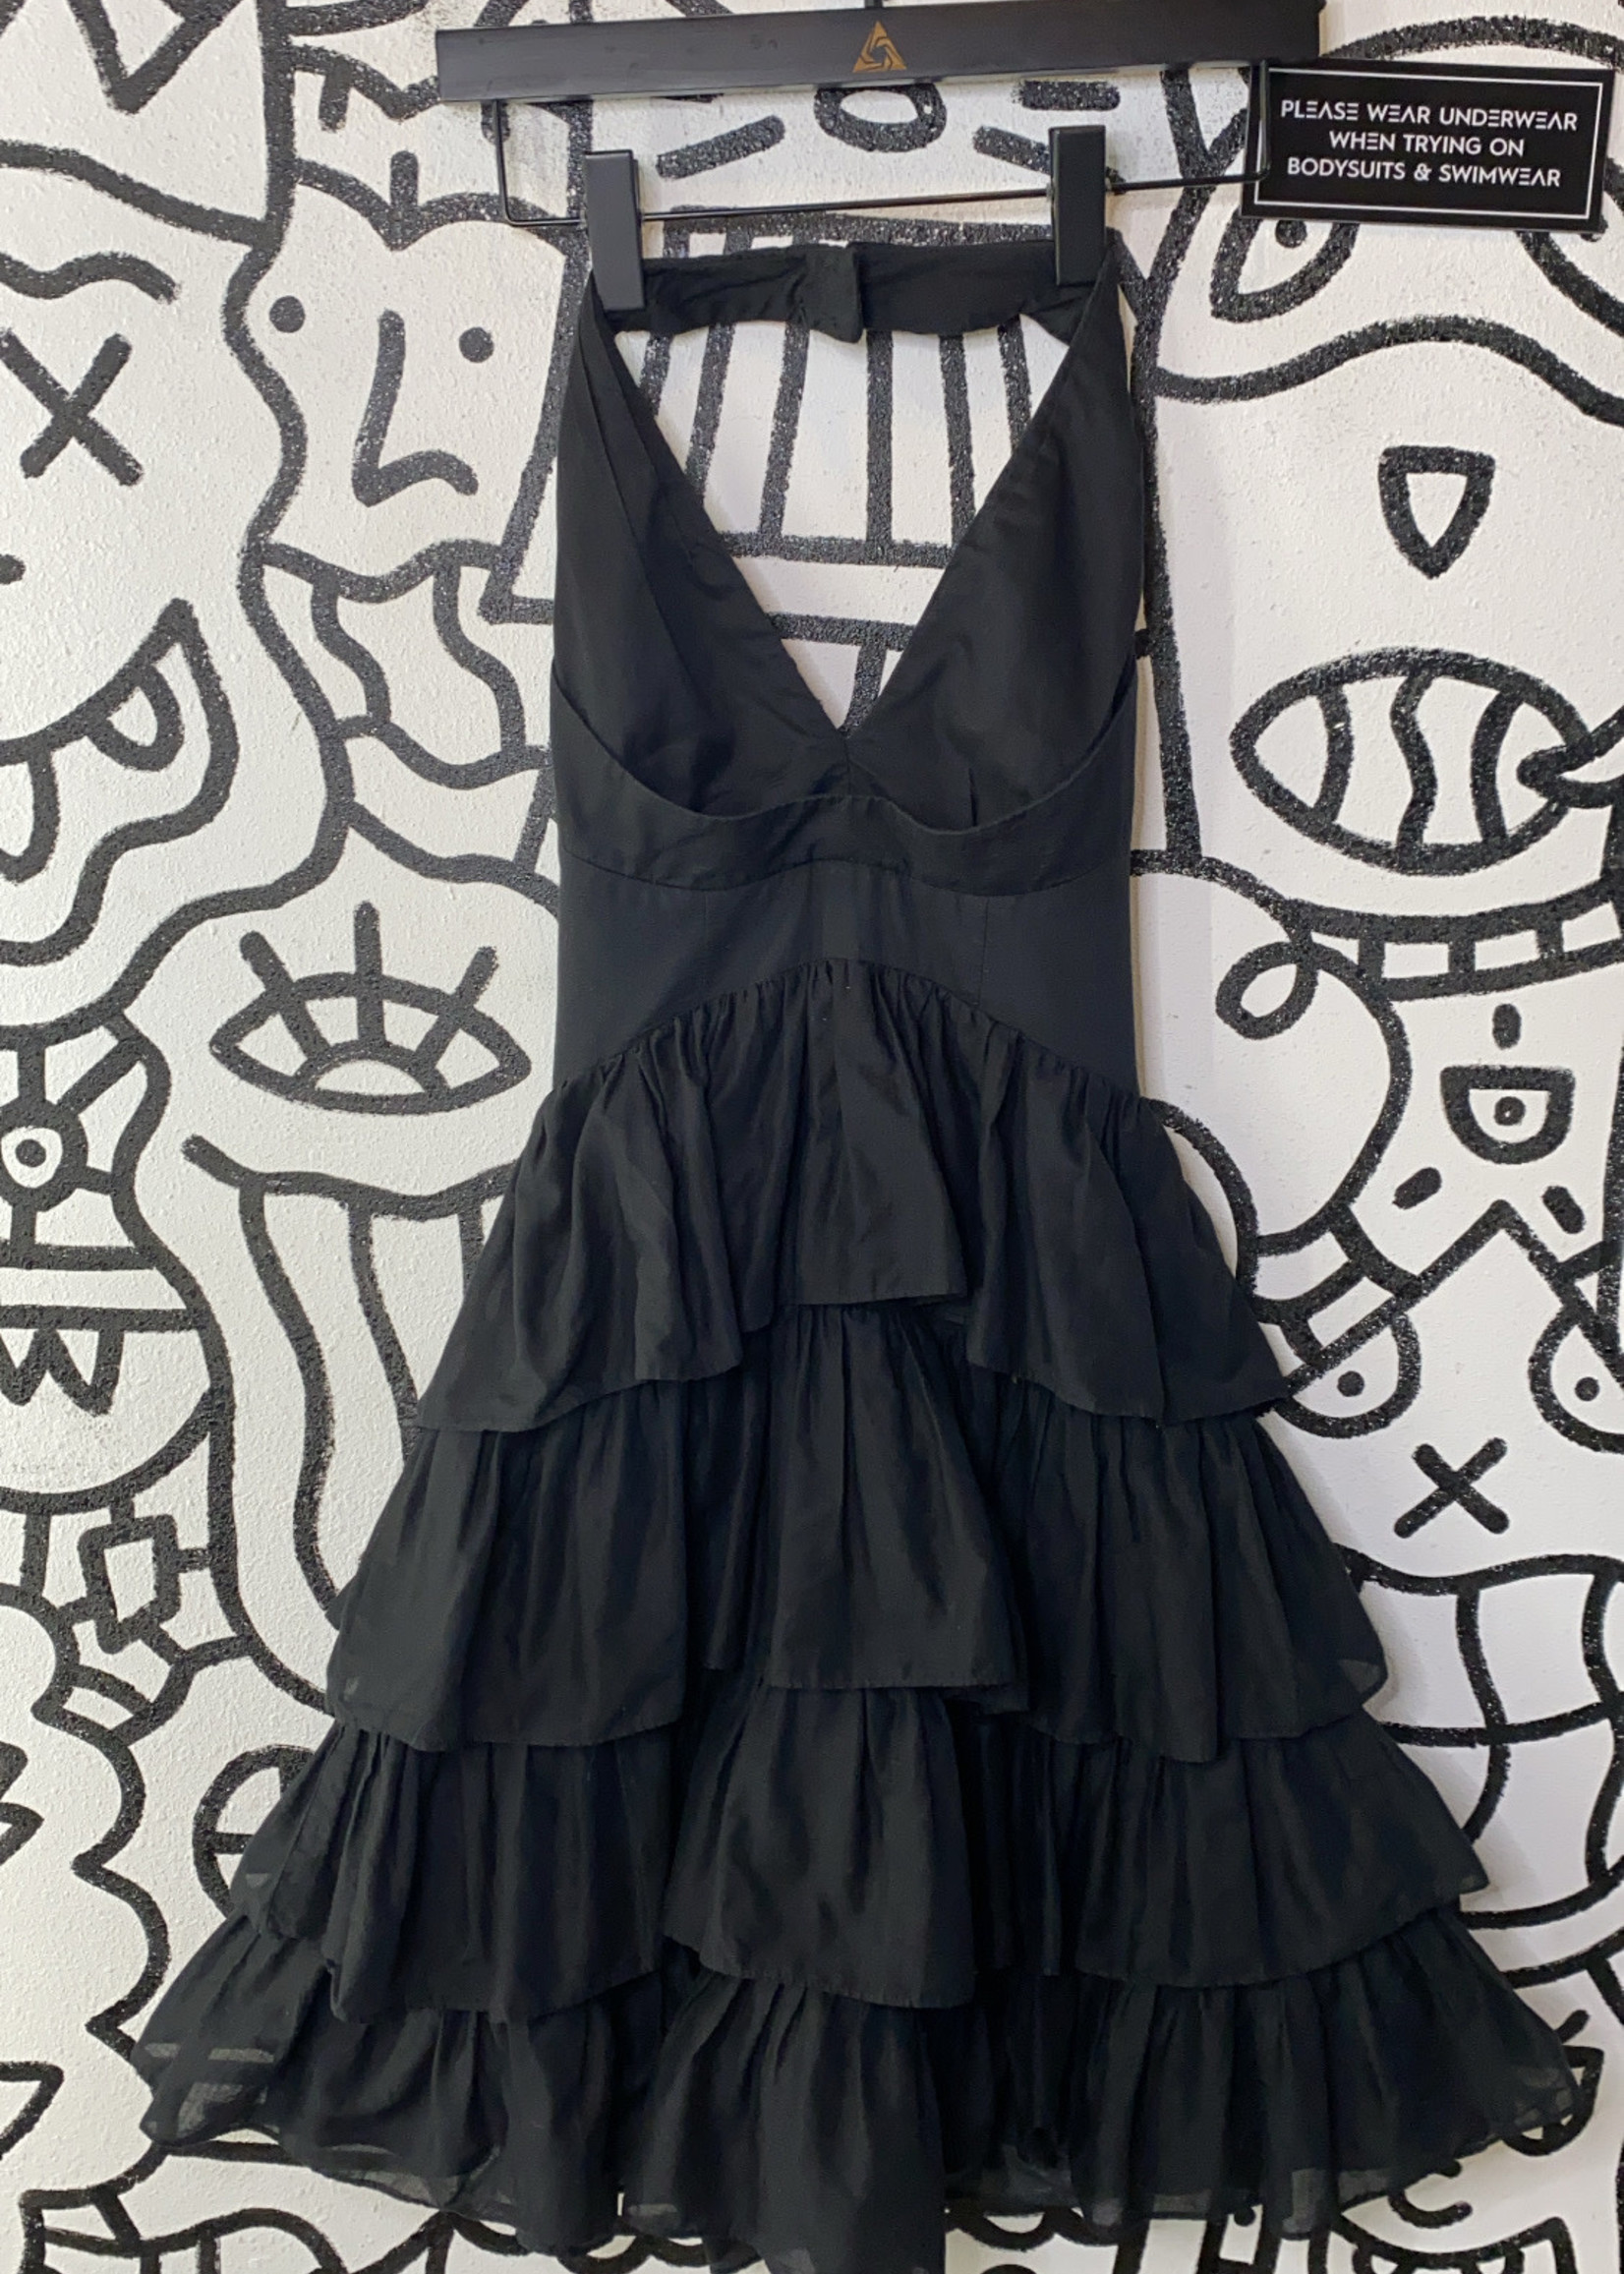 Betsey Johnson Black Halter Layered Ruffle Dress 2/XS